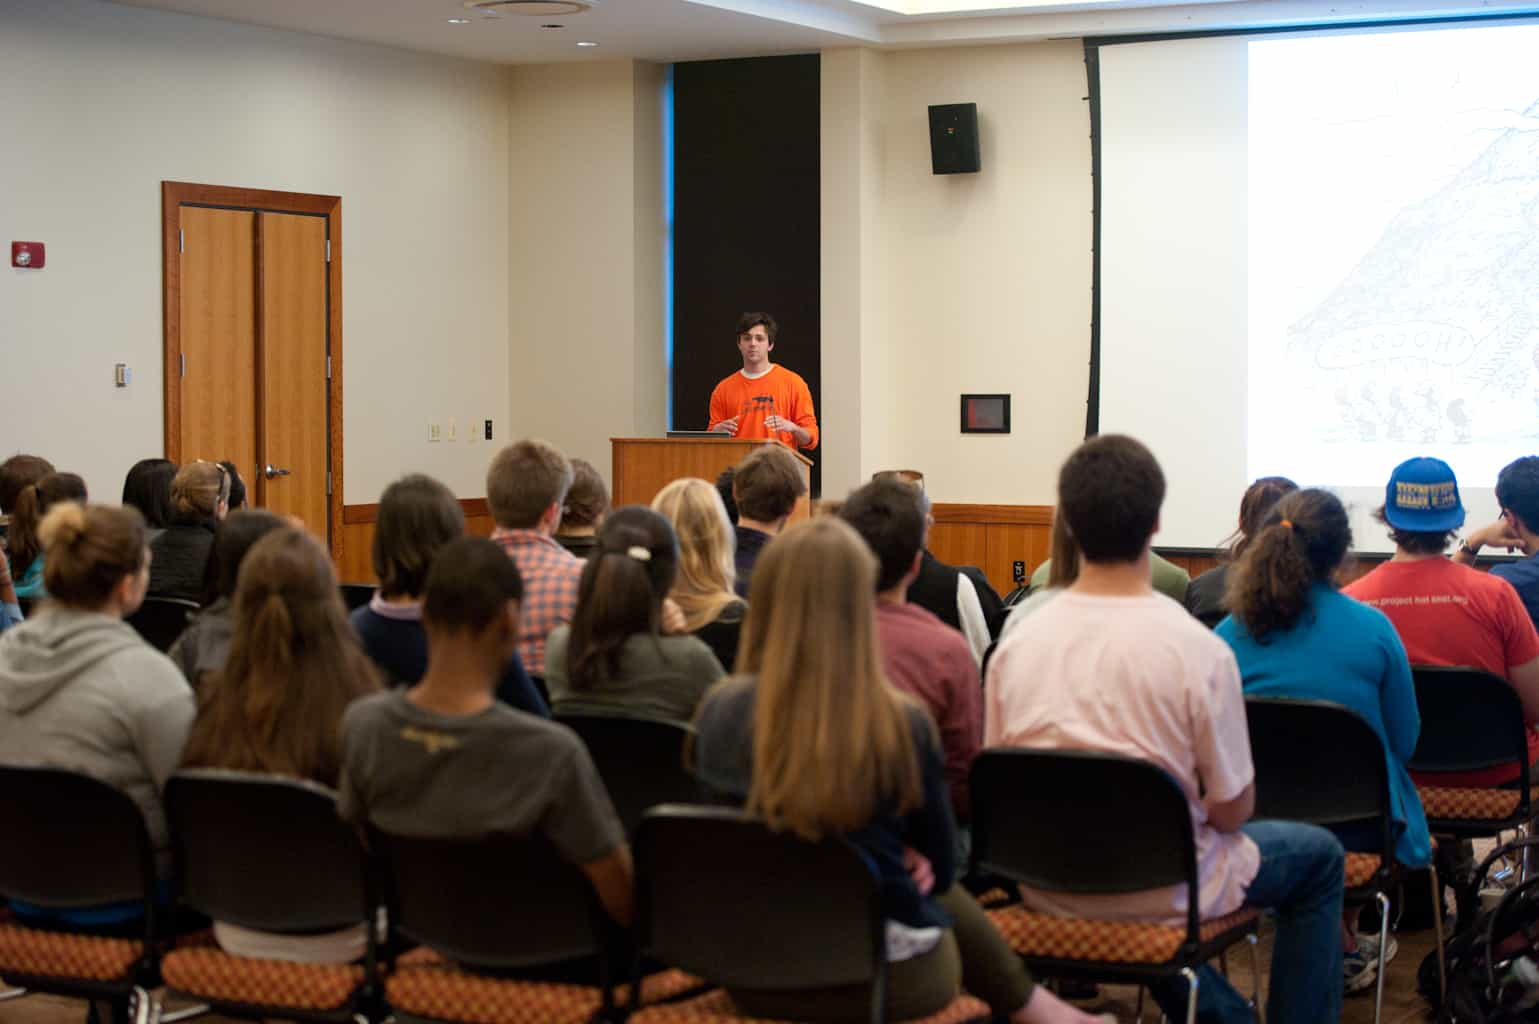 Undergrads at Boston College listen to  Bootstrap's take on social entrepreneurship